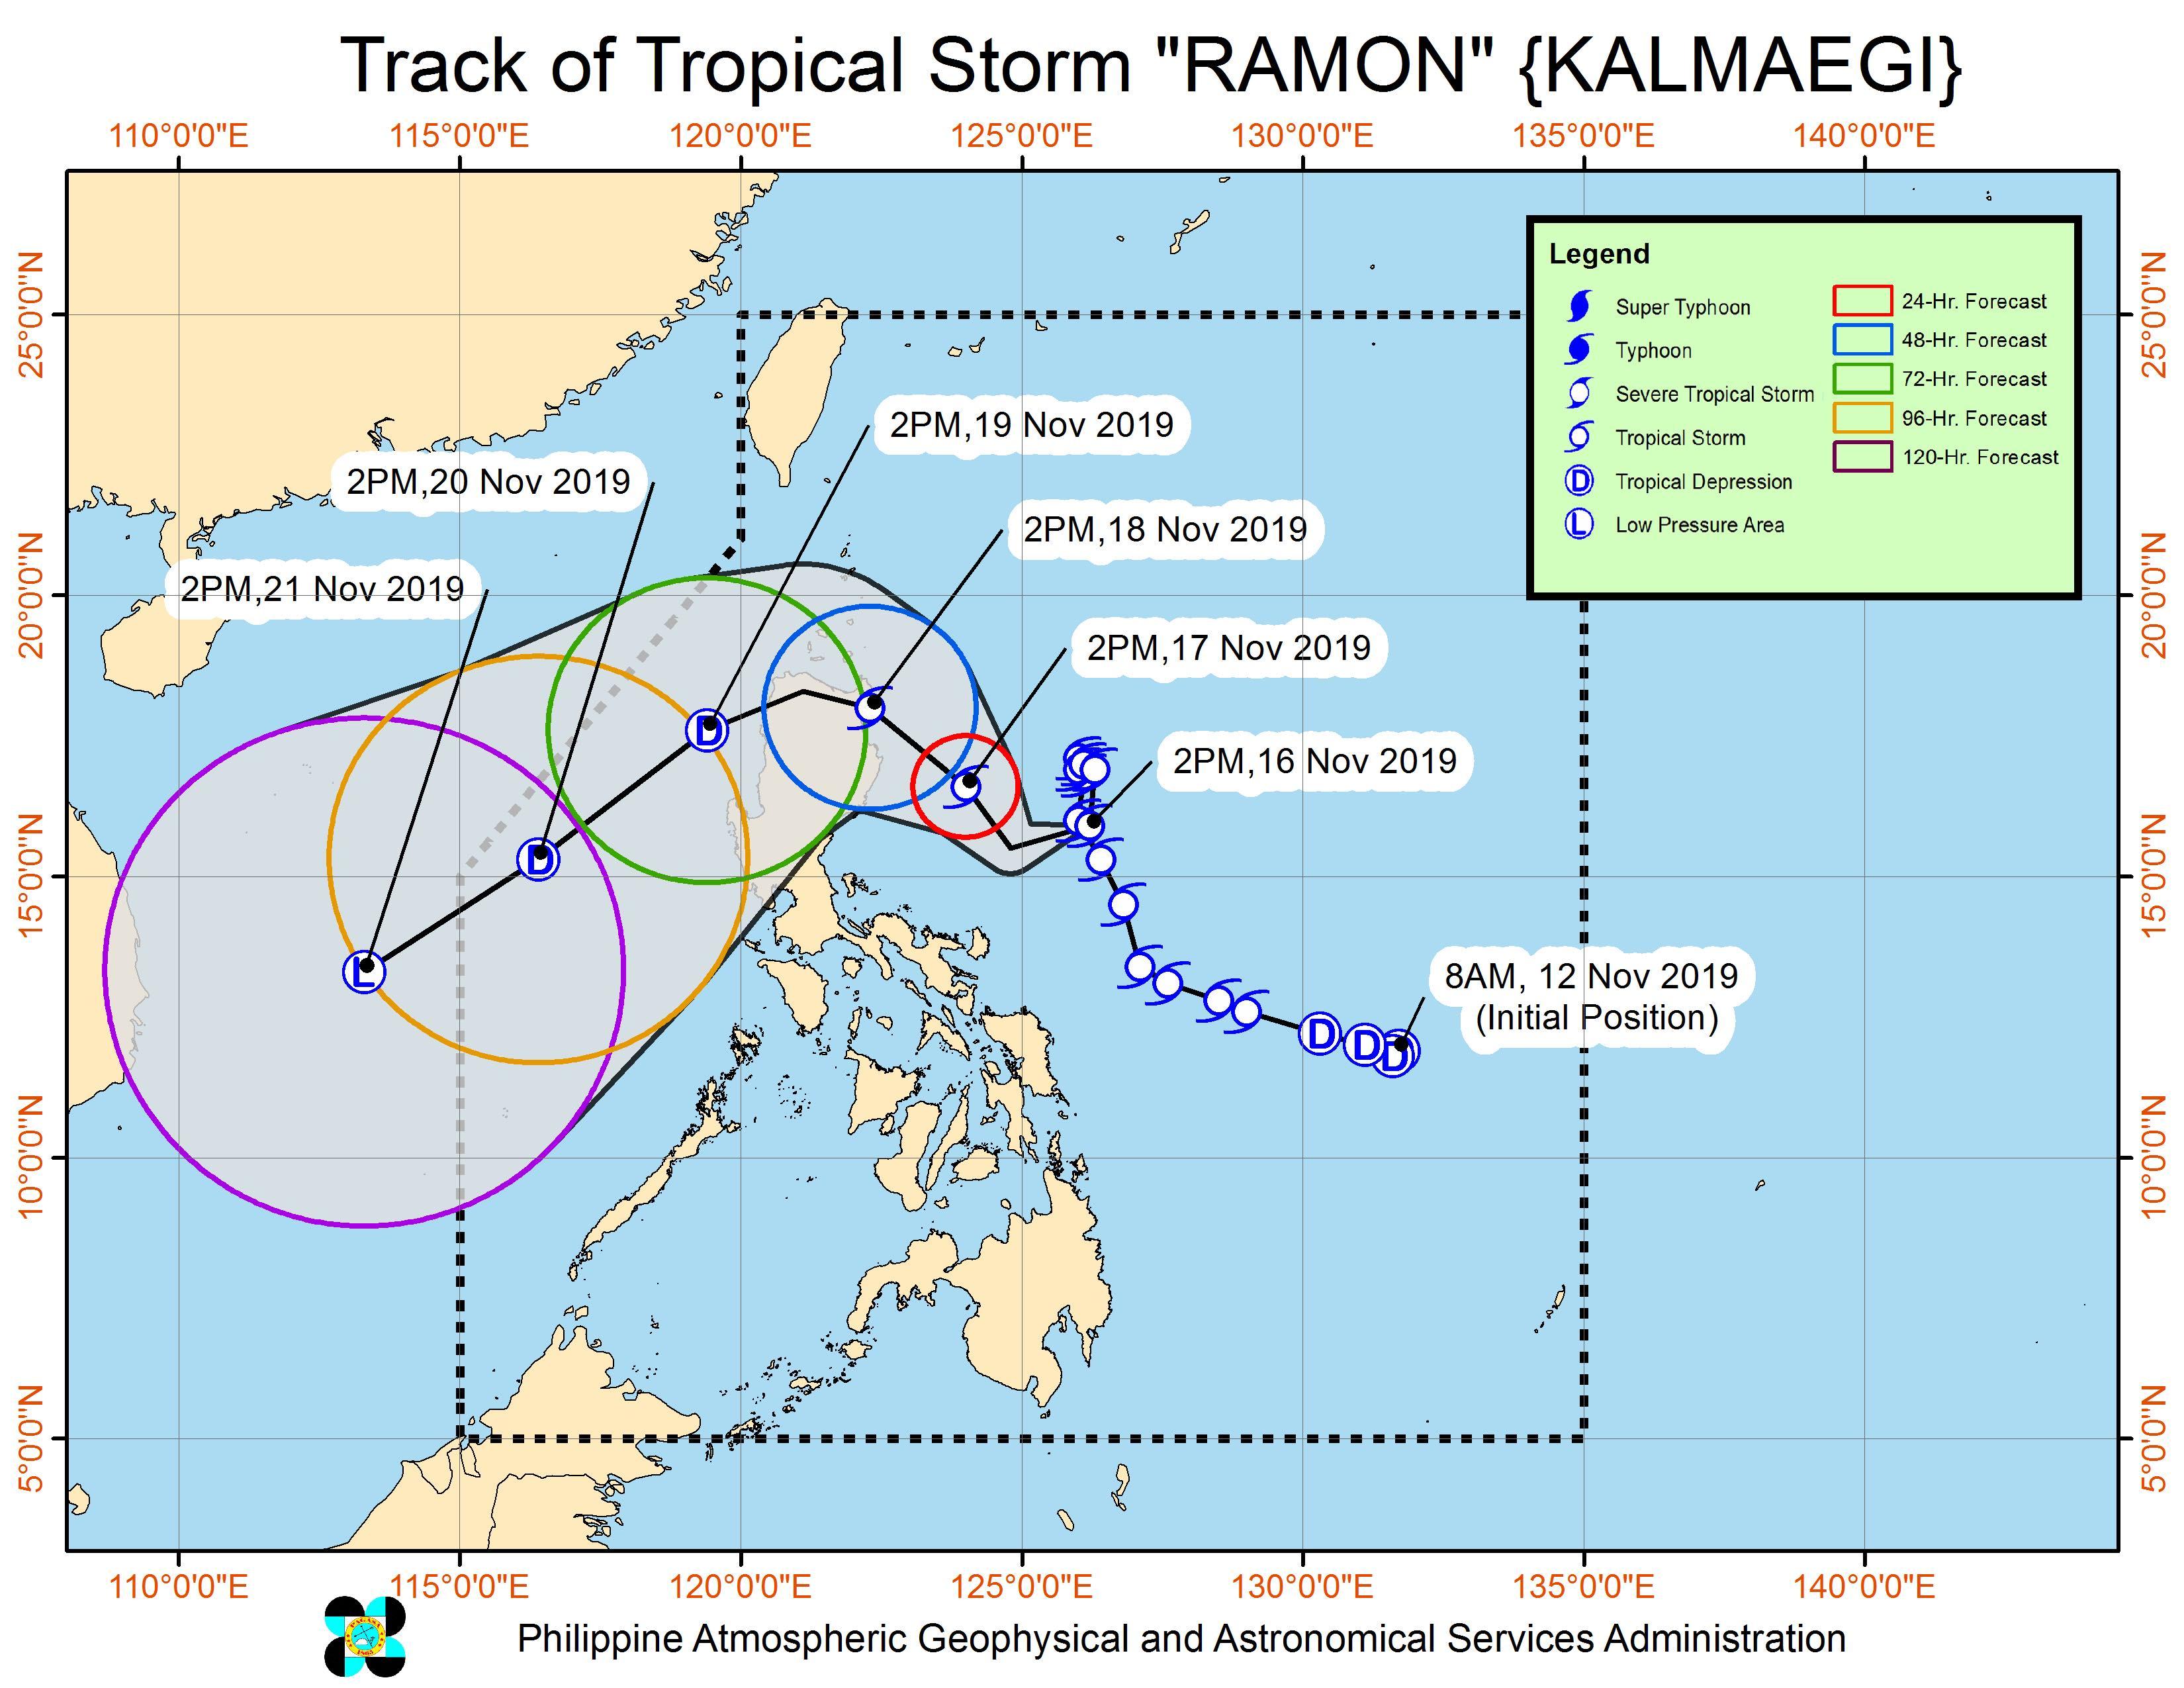 Forecast track of Tropical Storm Ramon (Kalmaegi) as of November 16, 2019, 5 pm. Image from PAGASA